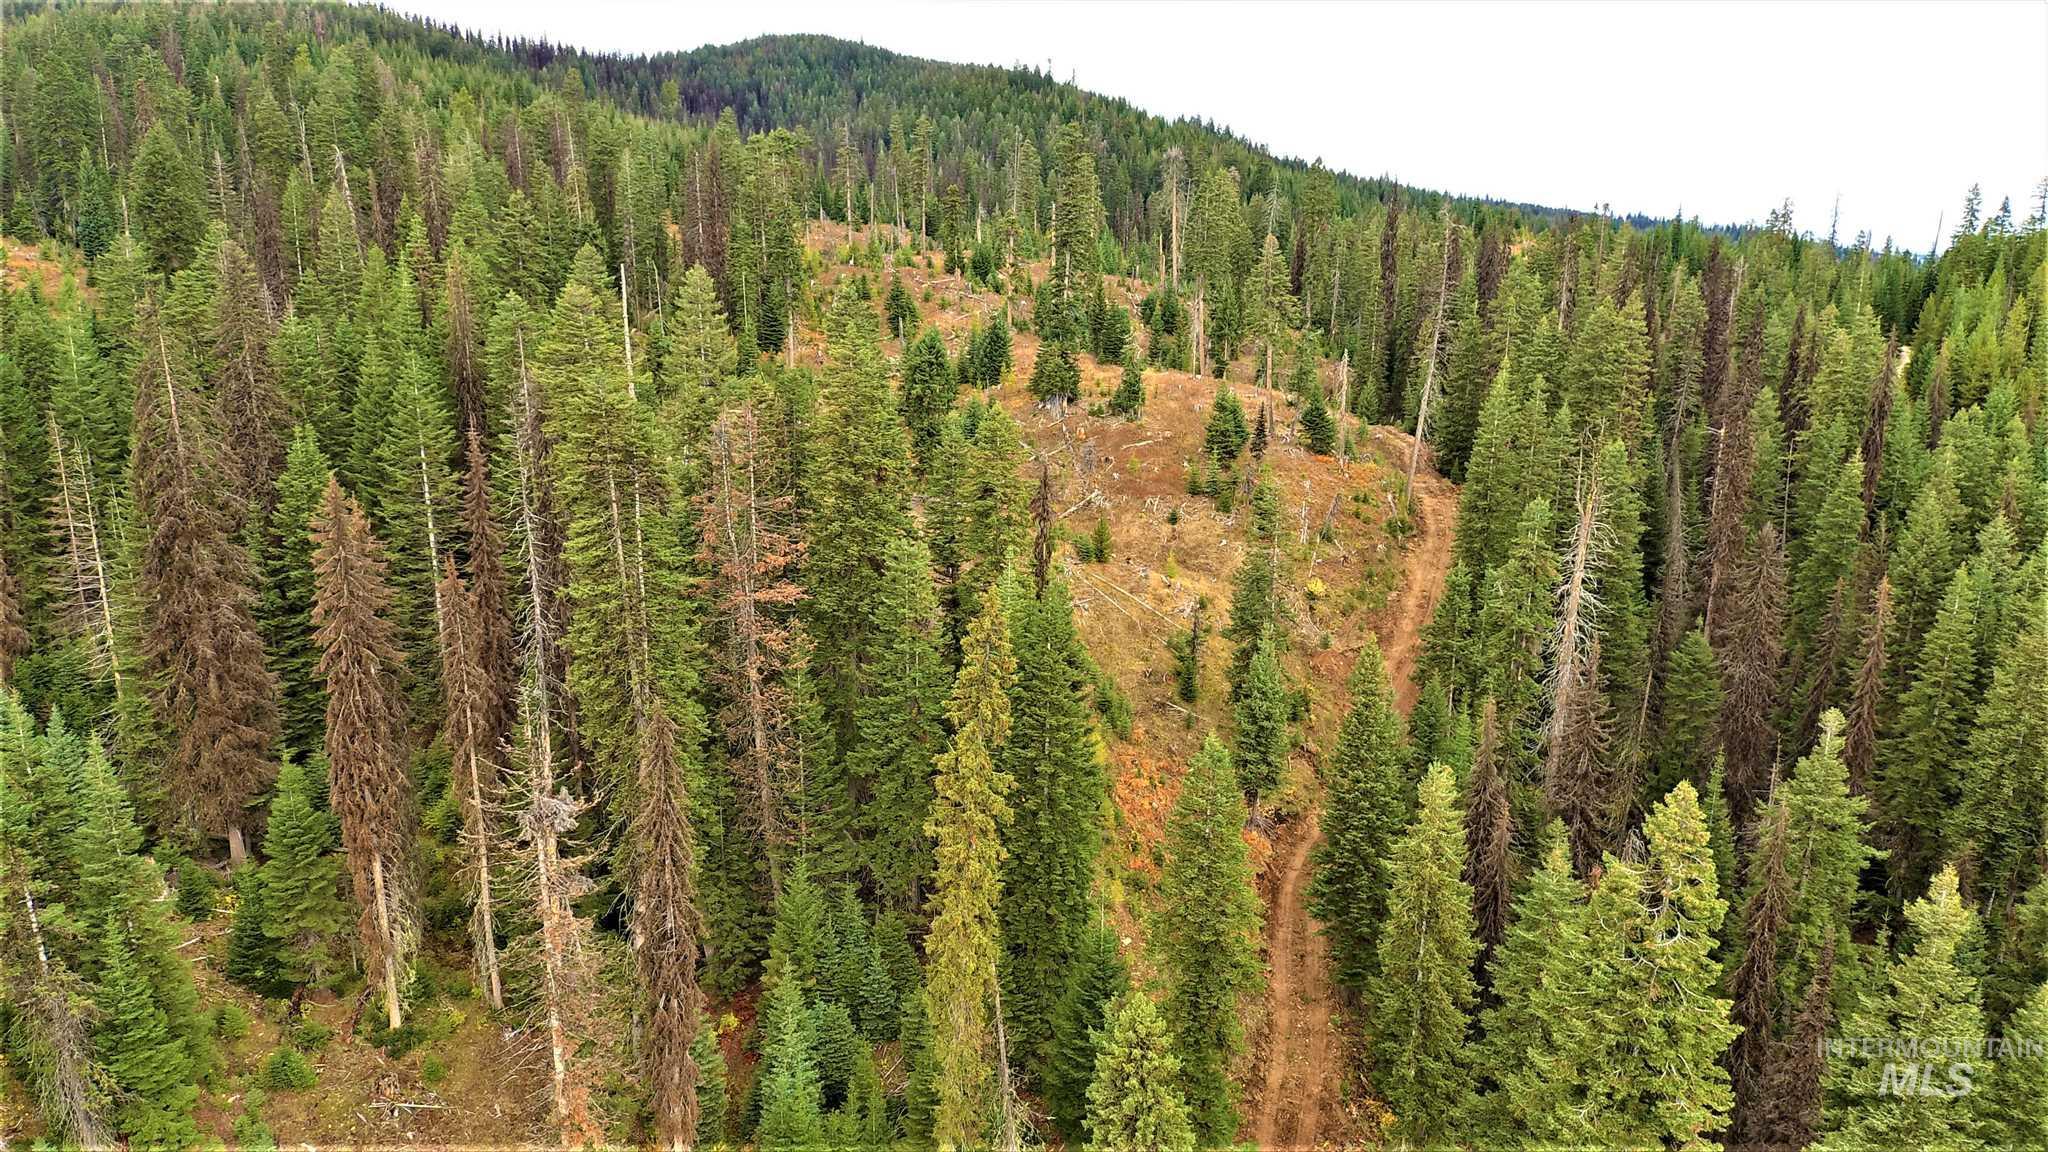 Tbd Elk Summit Properties Parcel 2 Property Photo